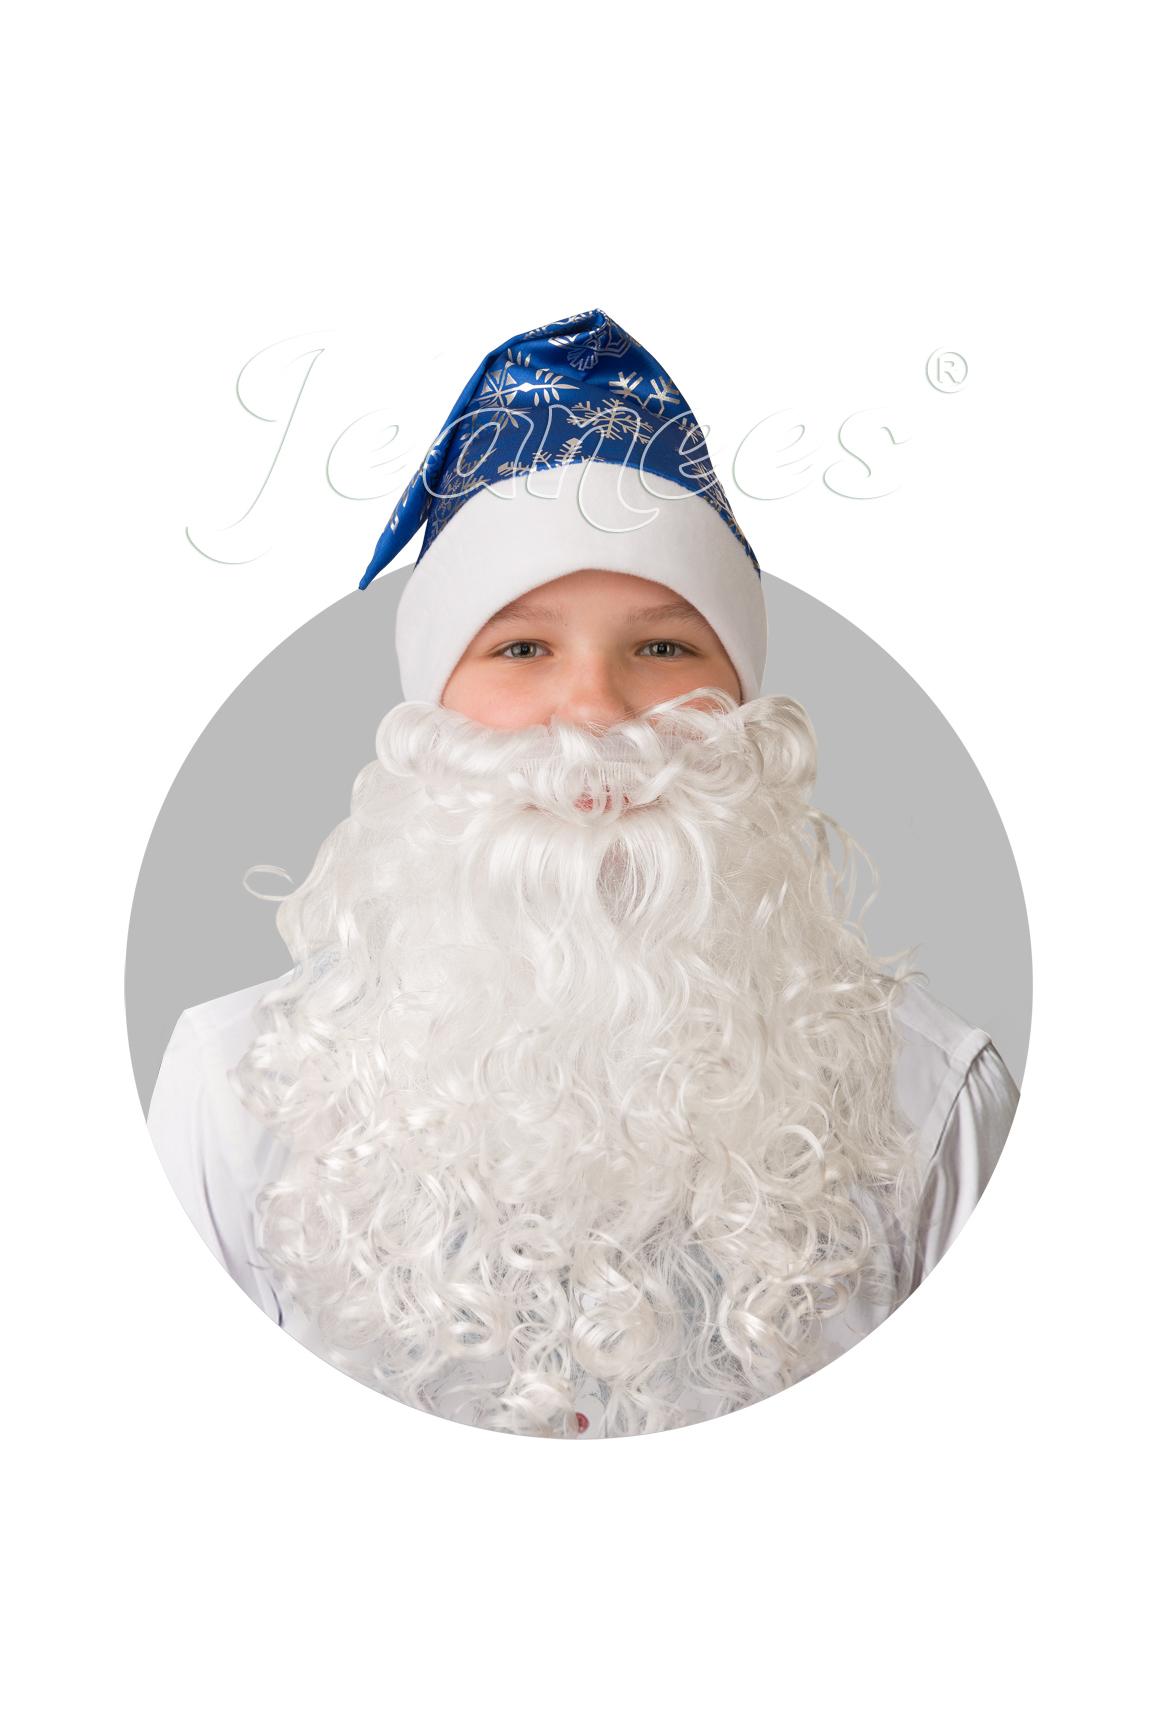 Колпак Новогодний синий с бородой, сатин со снежинками